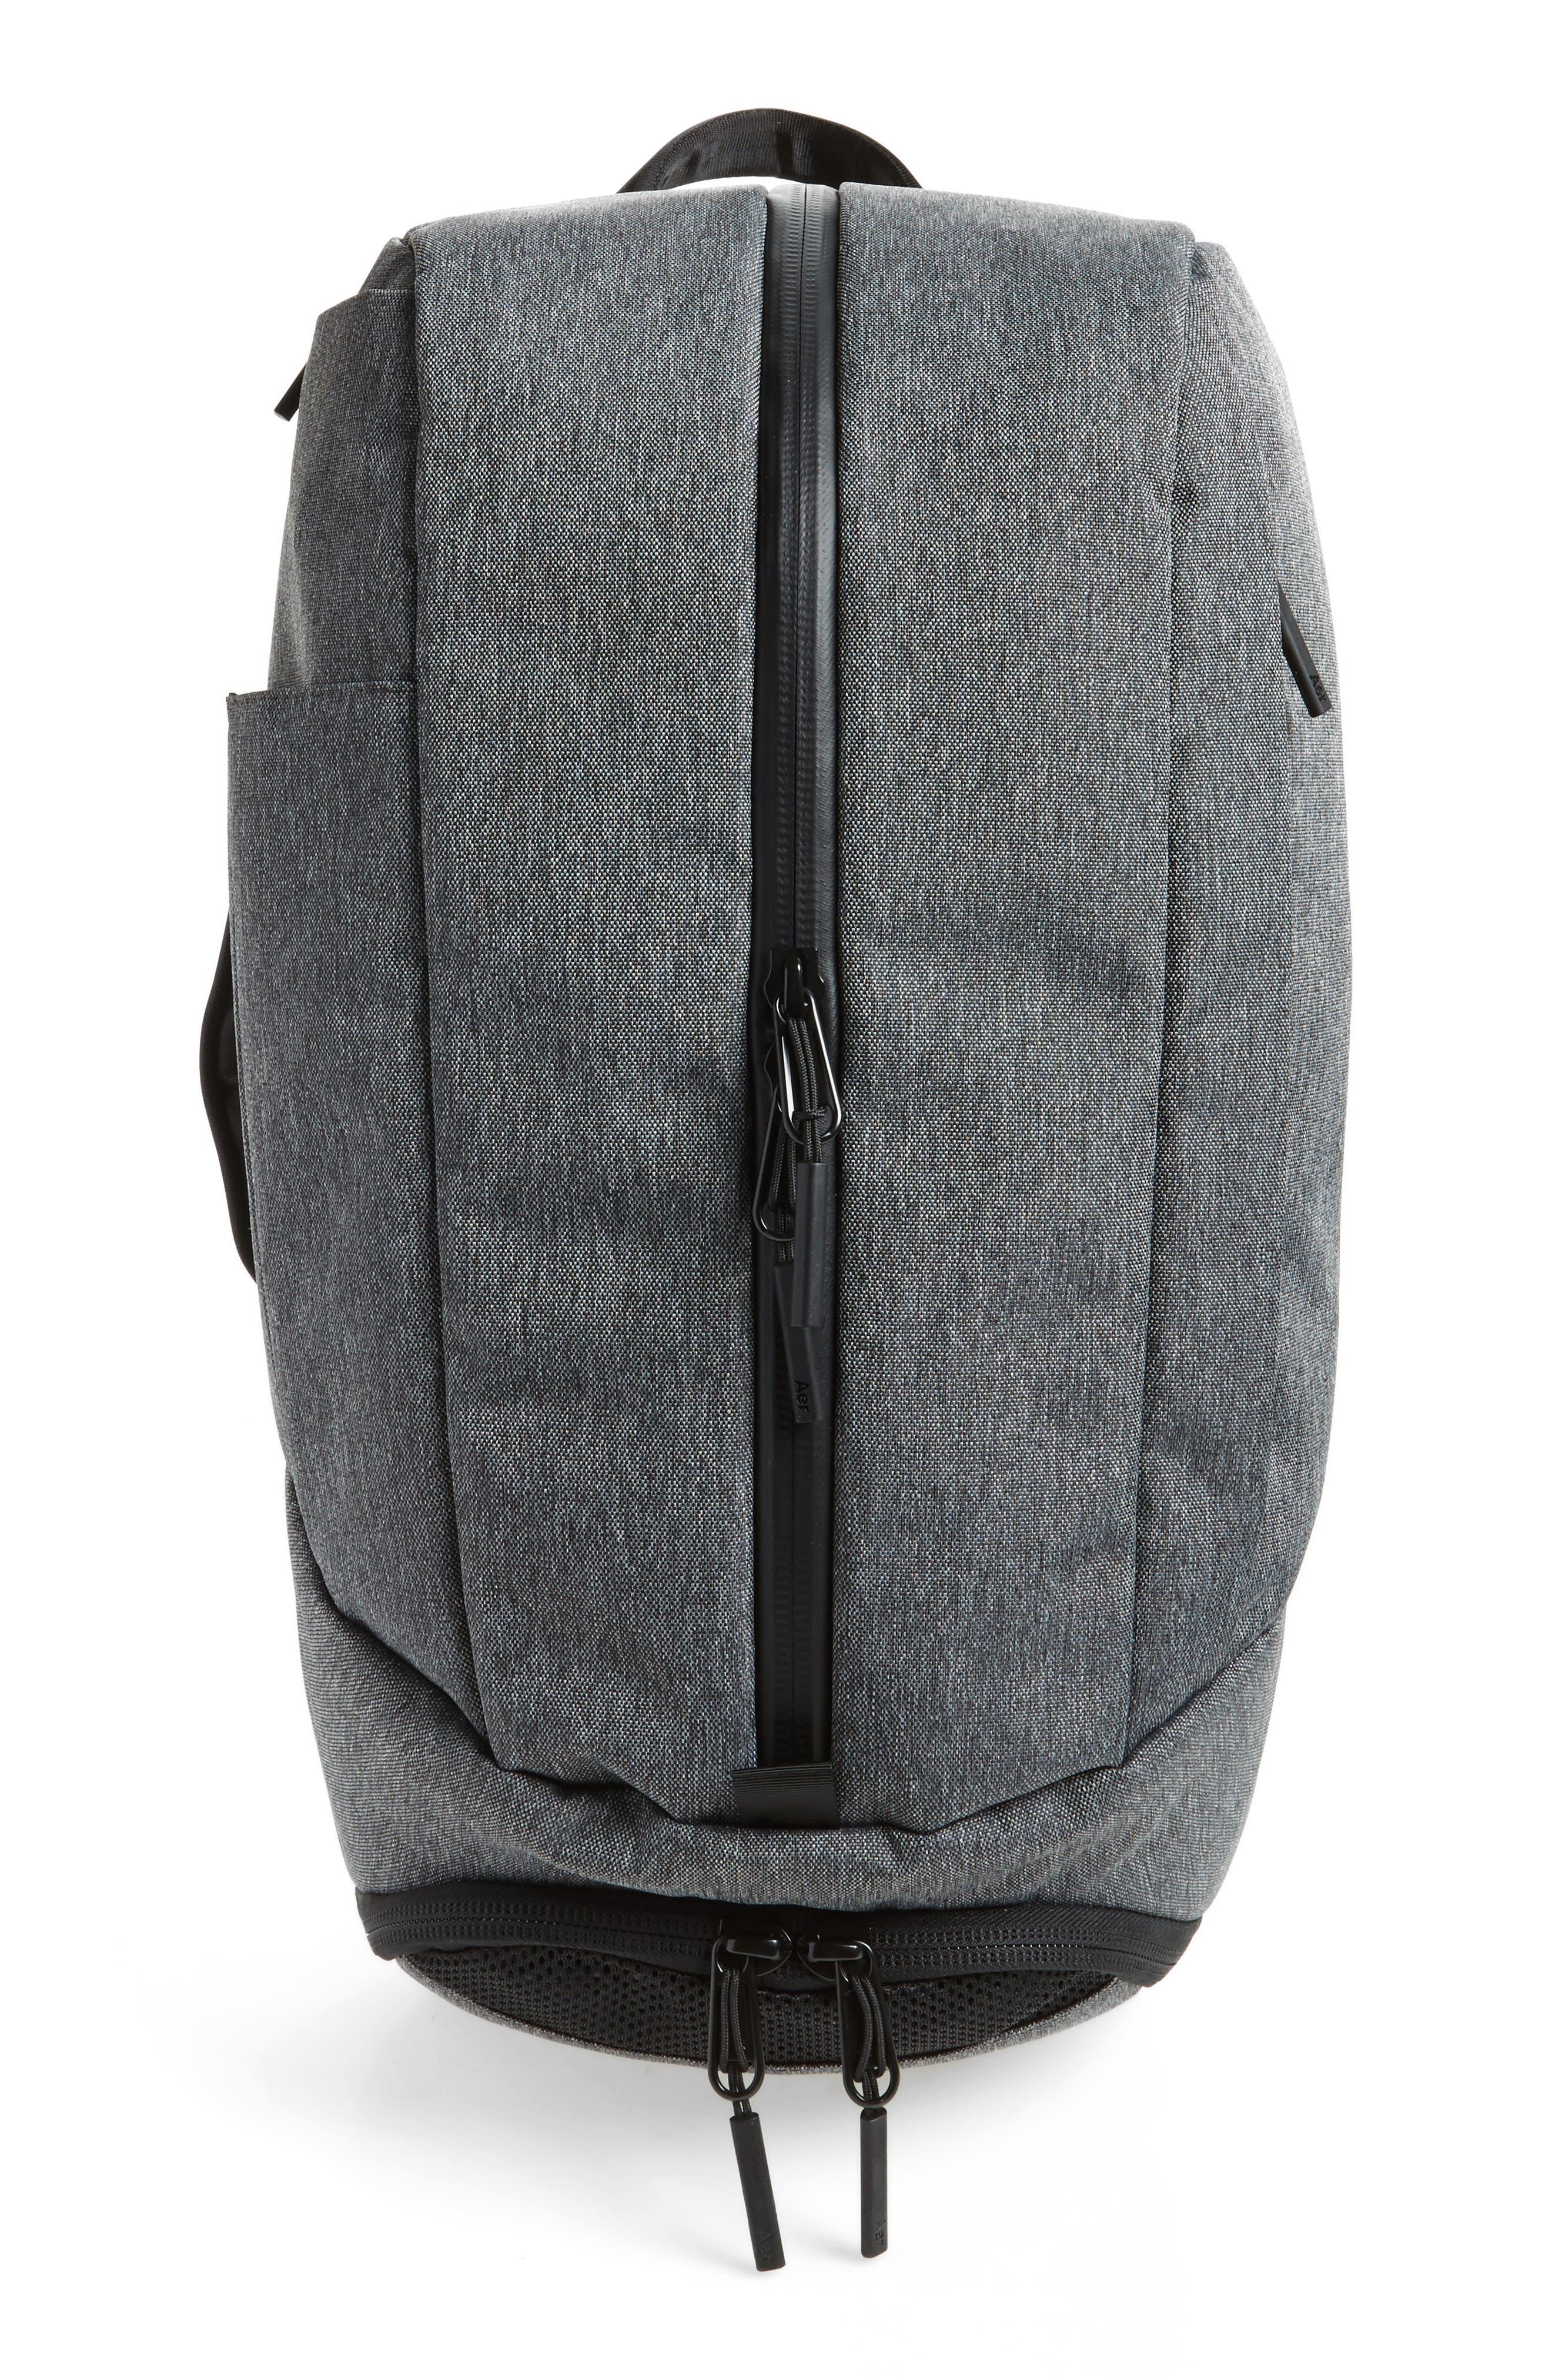 Alternate Image 1 Selected - Aer Duffel Pack 2 Convertible Backpack